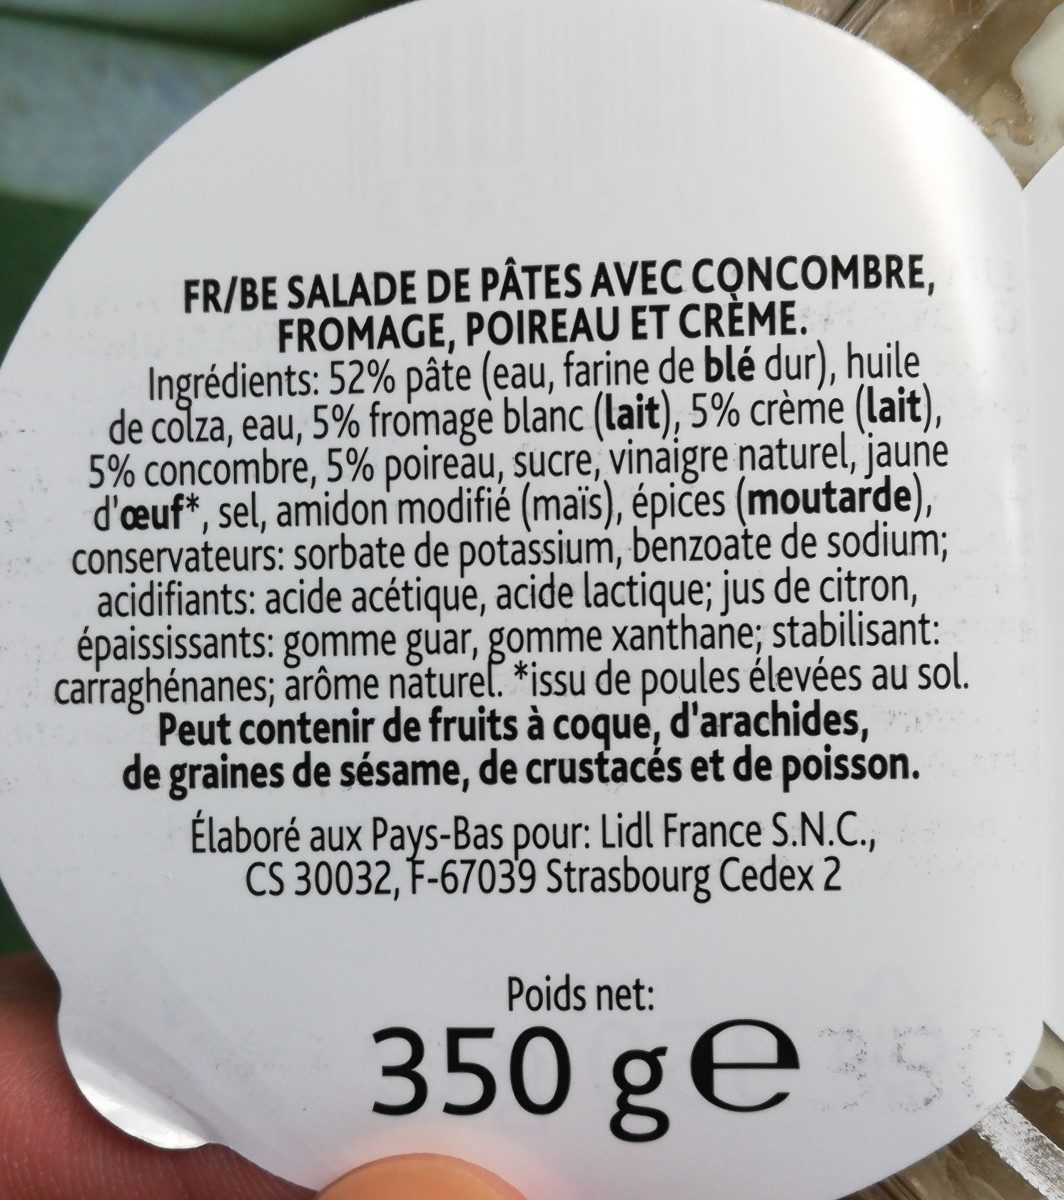 Salade de pâtes - Ingrédients - fr